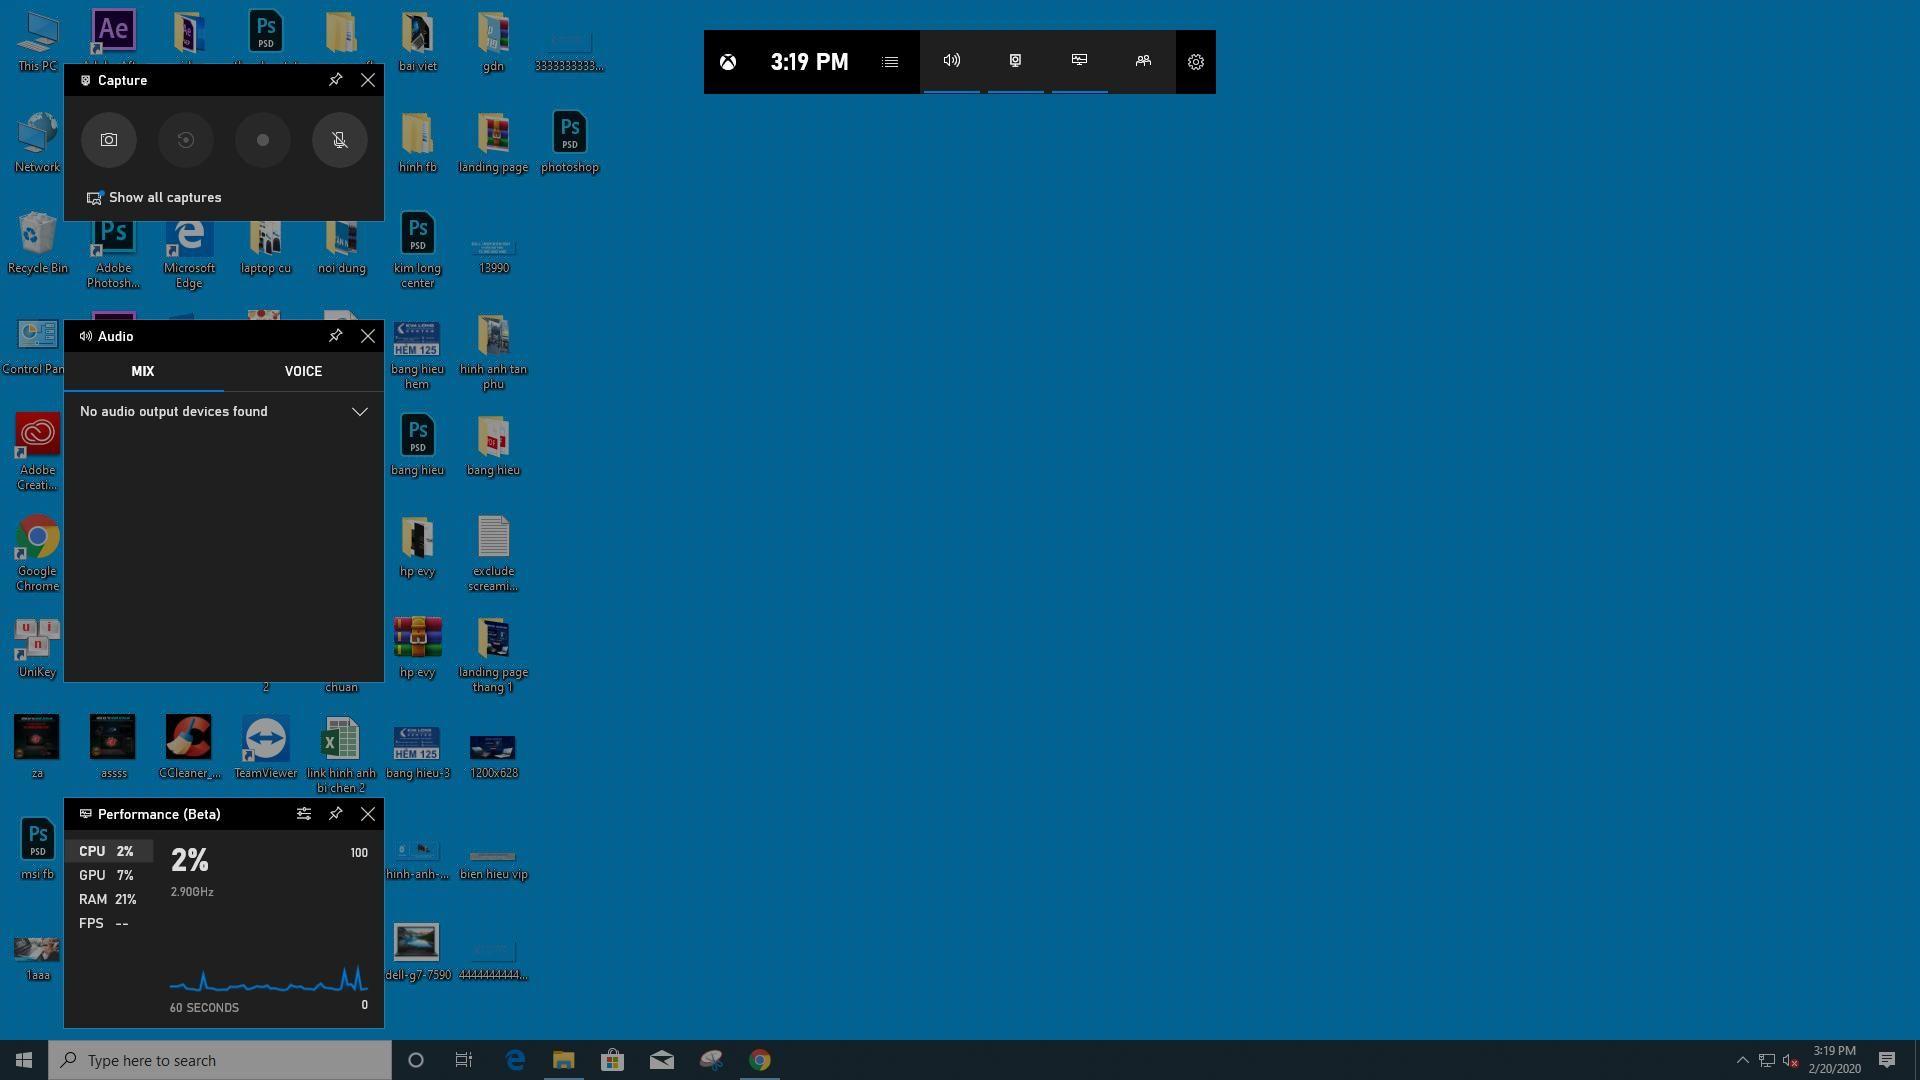 Game Bar on Windows 10